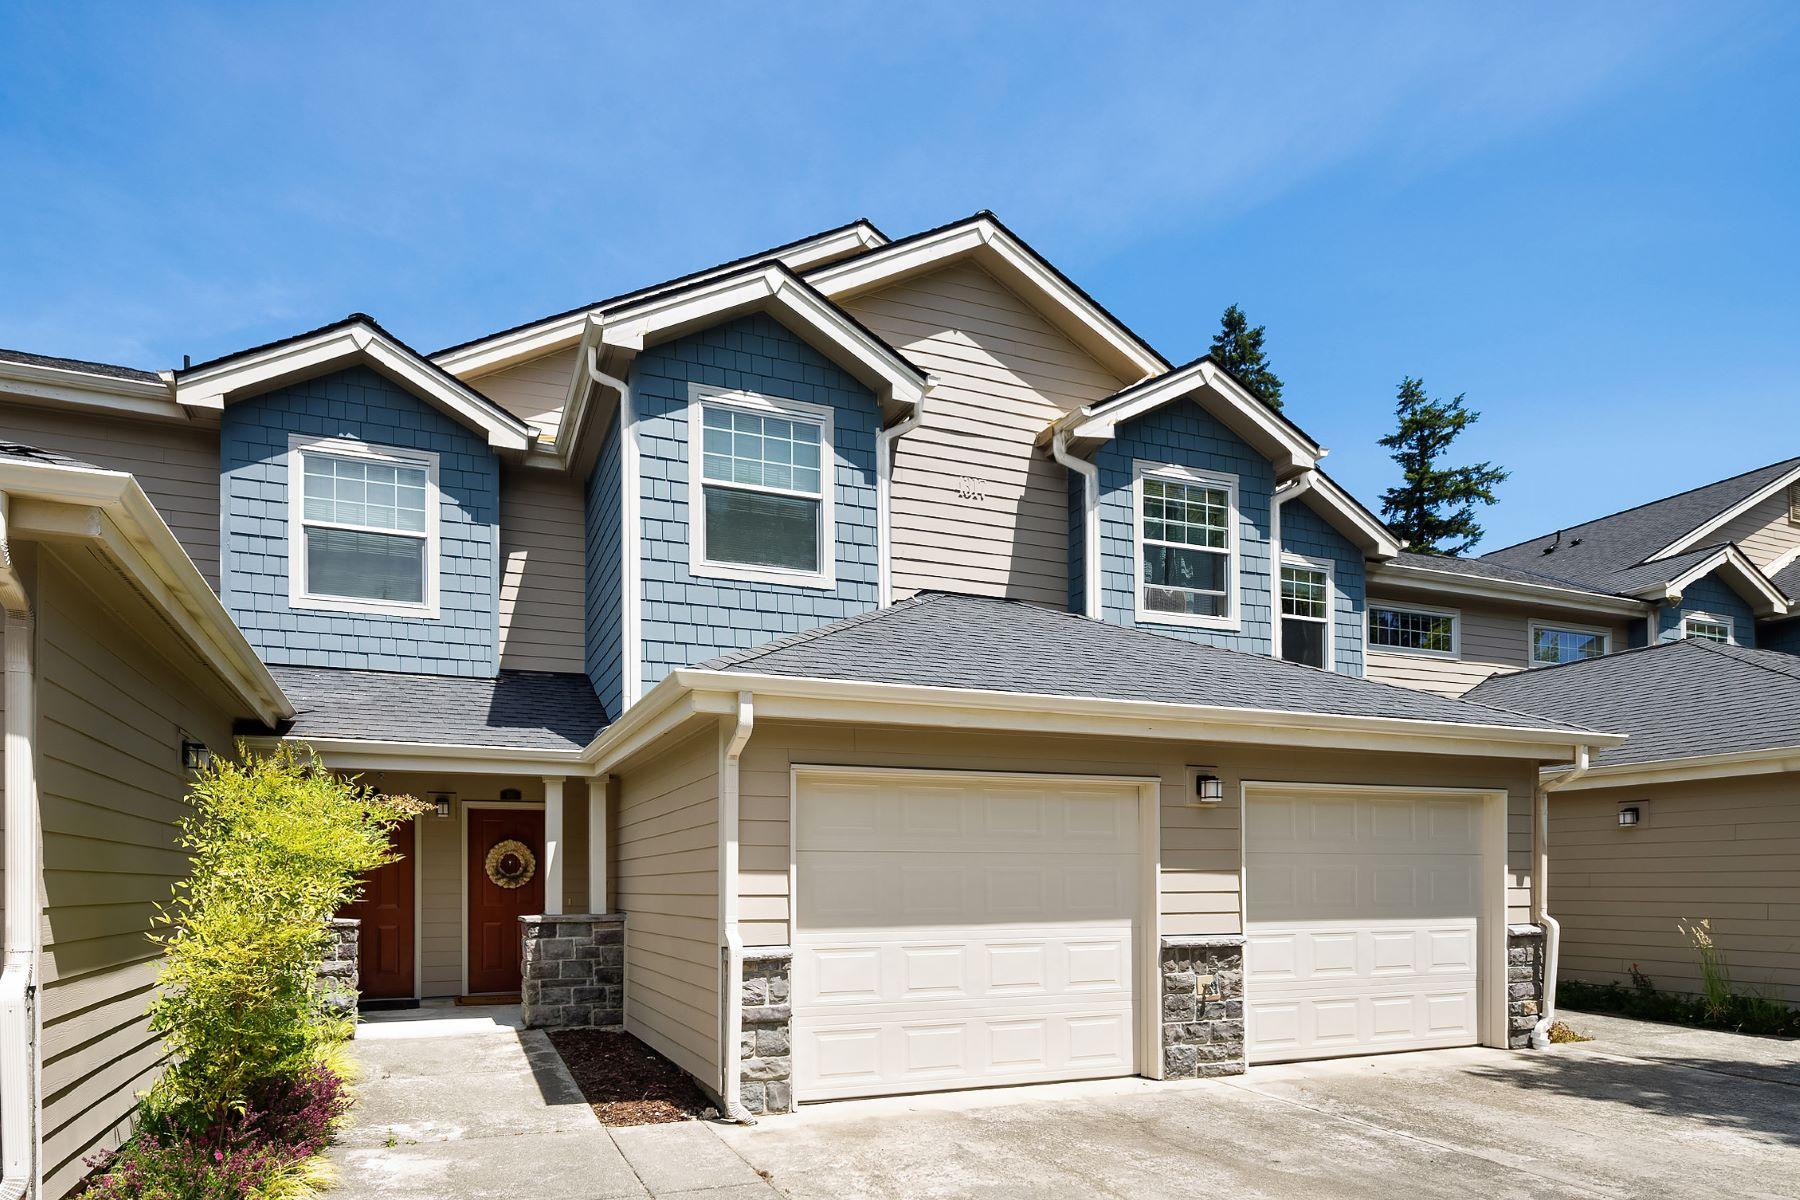 Condominiums για την Πώληση στο Serenity at Jacob's Creek 4317 Issaquah Pine Lake Rd SE, Unit #310, Sammamish, Ουασινγκτον 98075 Ηνωμένες Πολιτείες